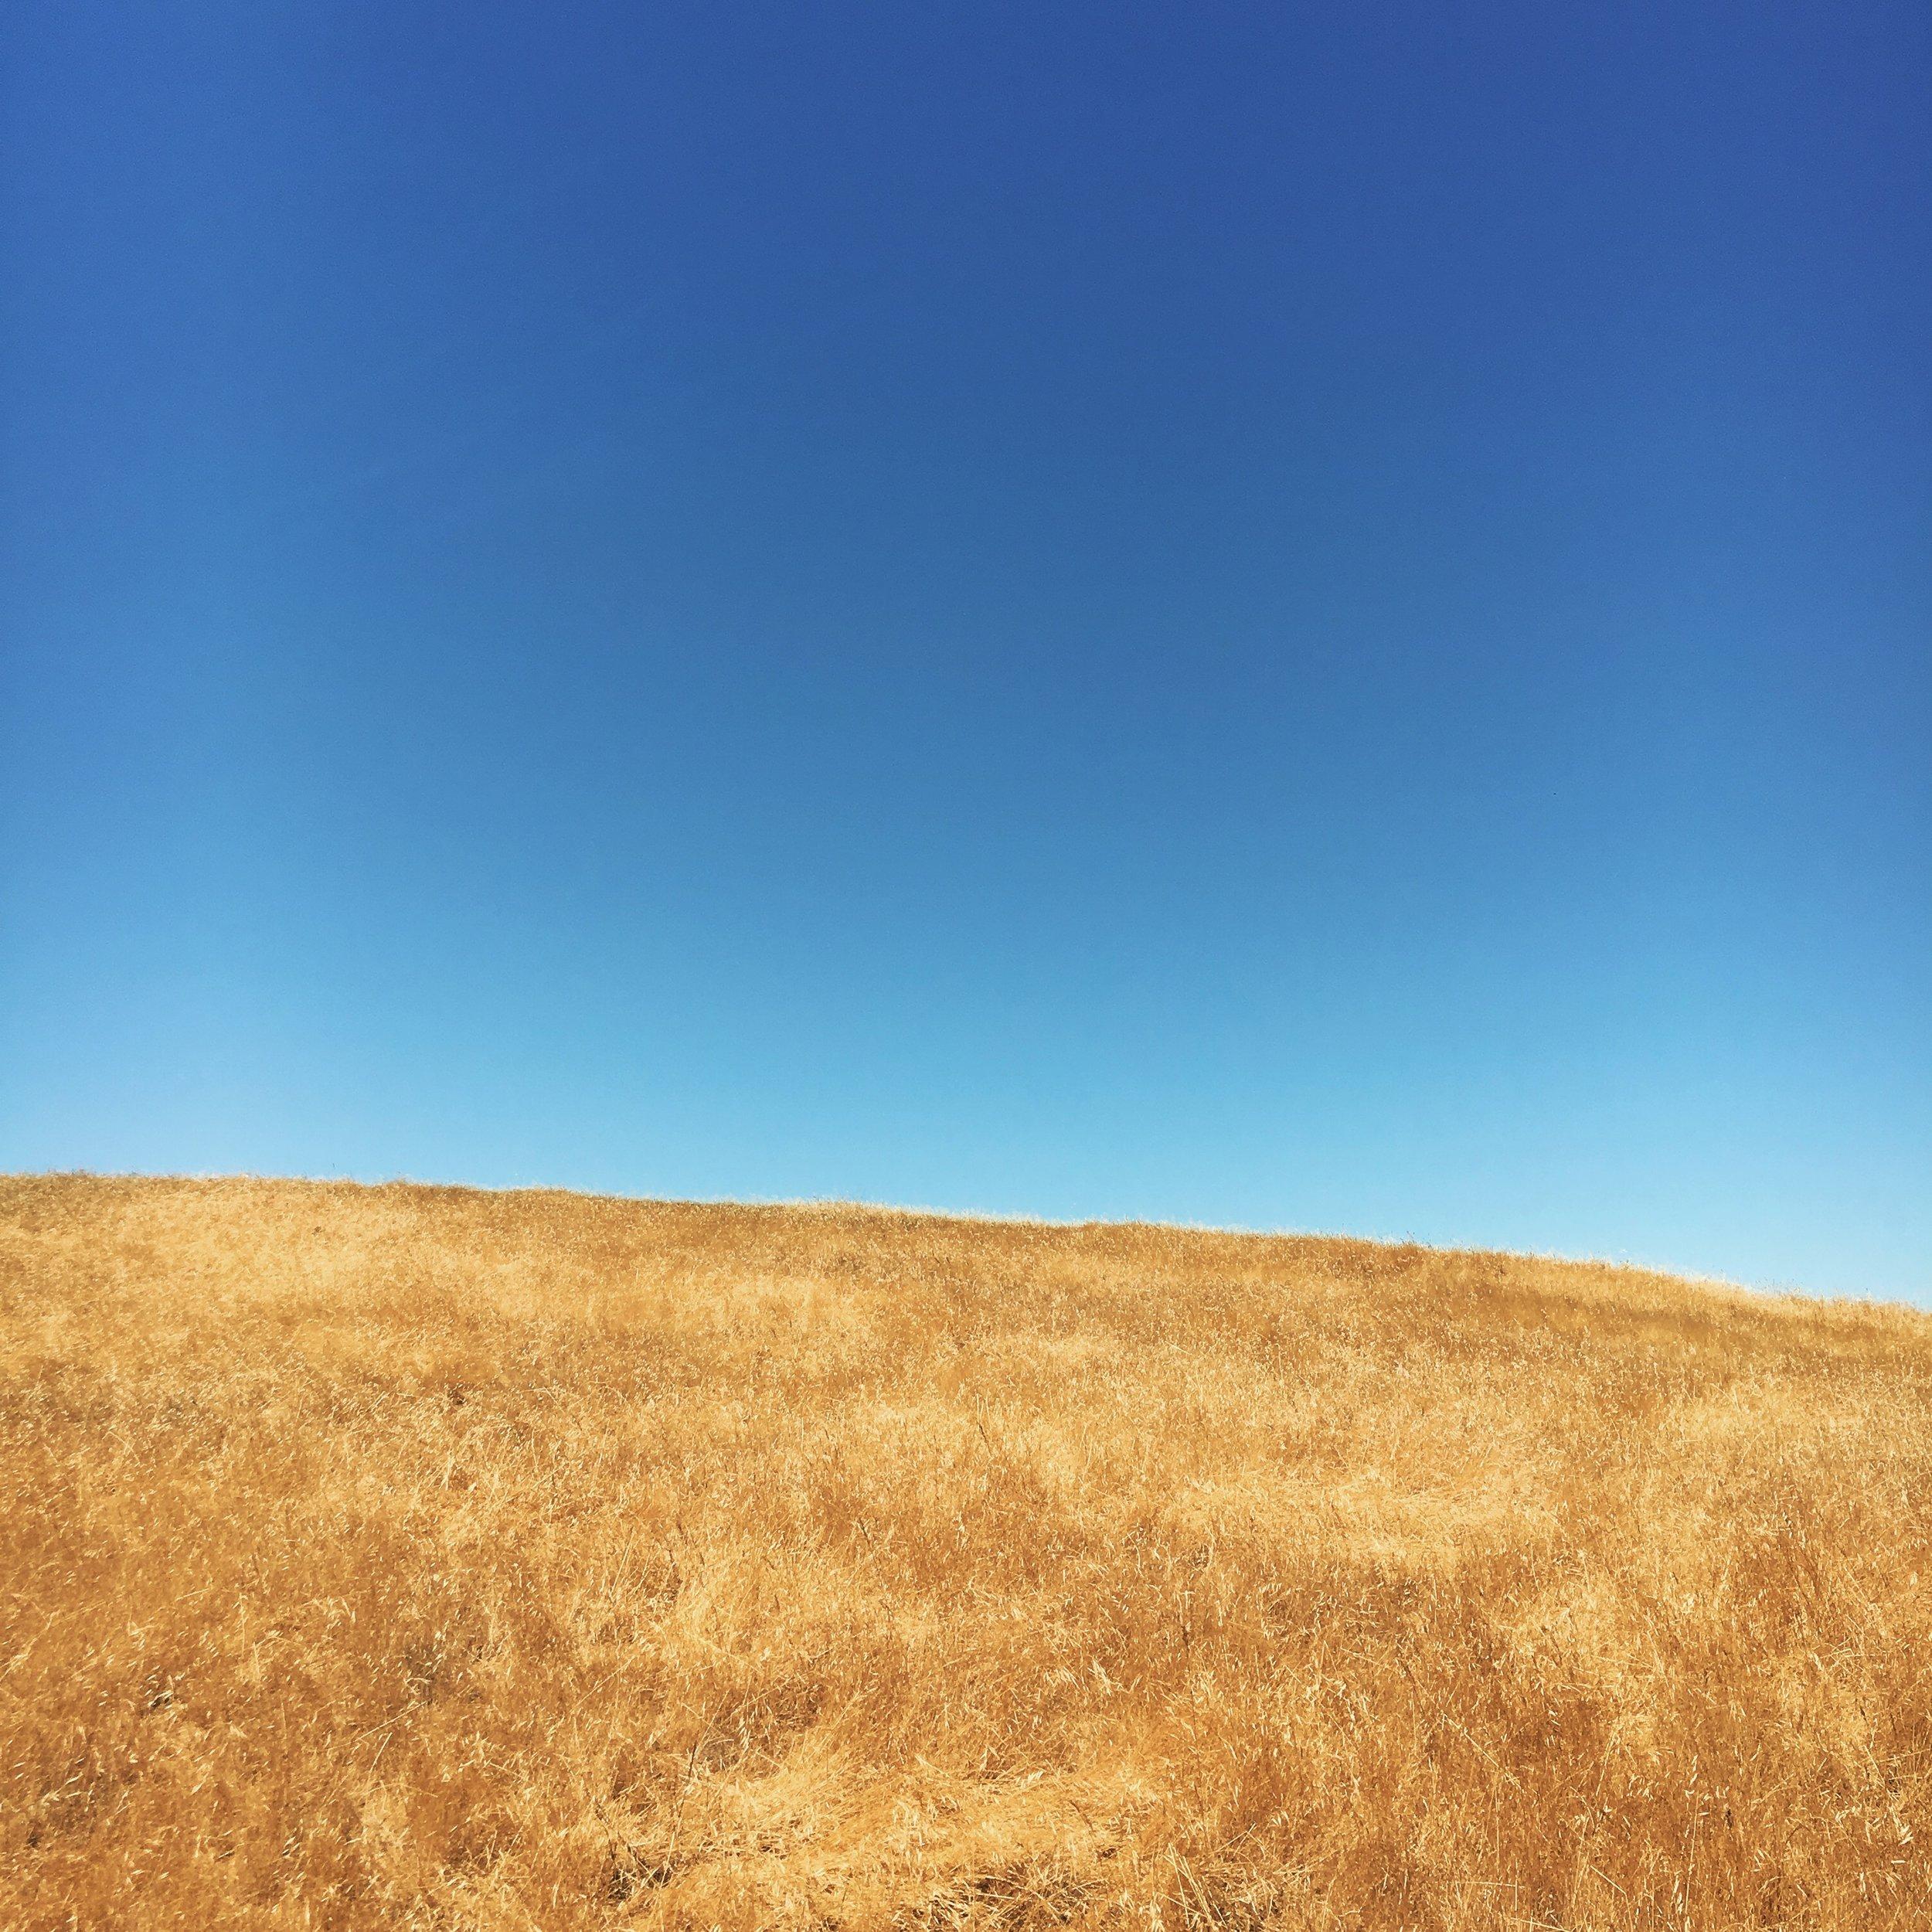 golden California hills, blue sky, summer, solstice